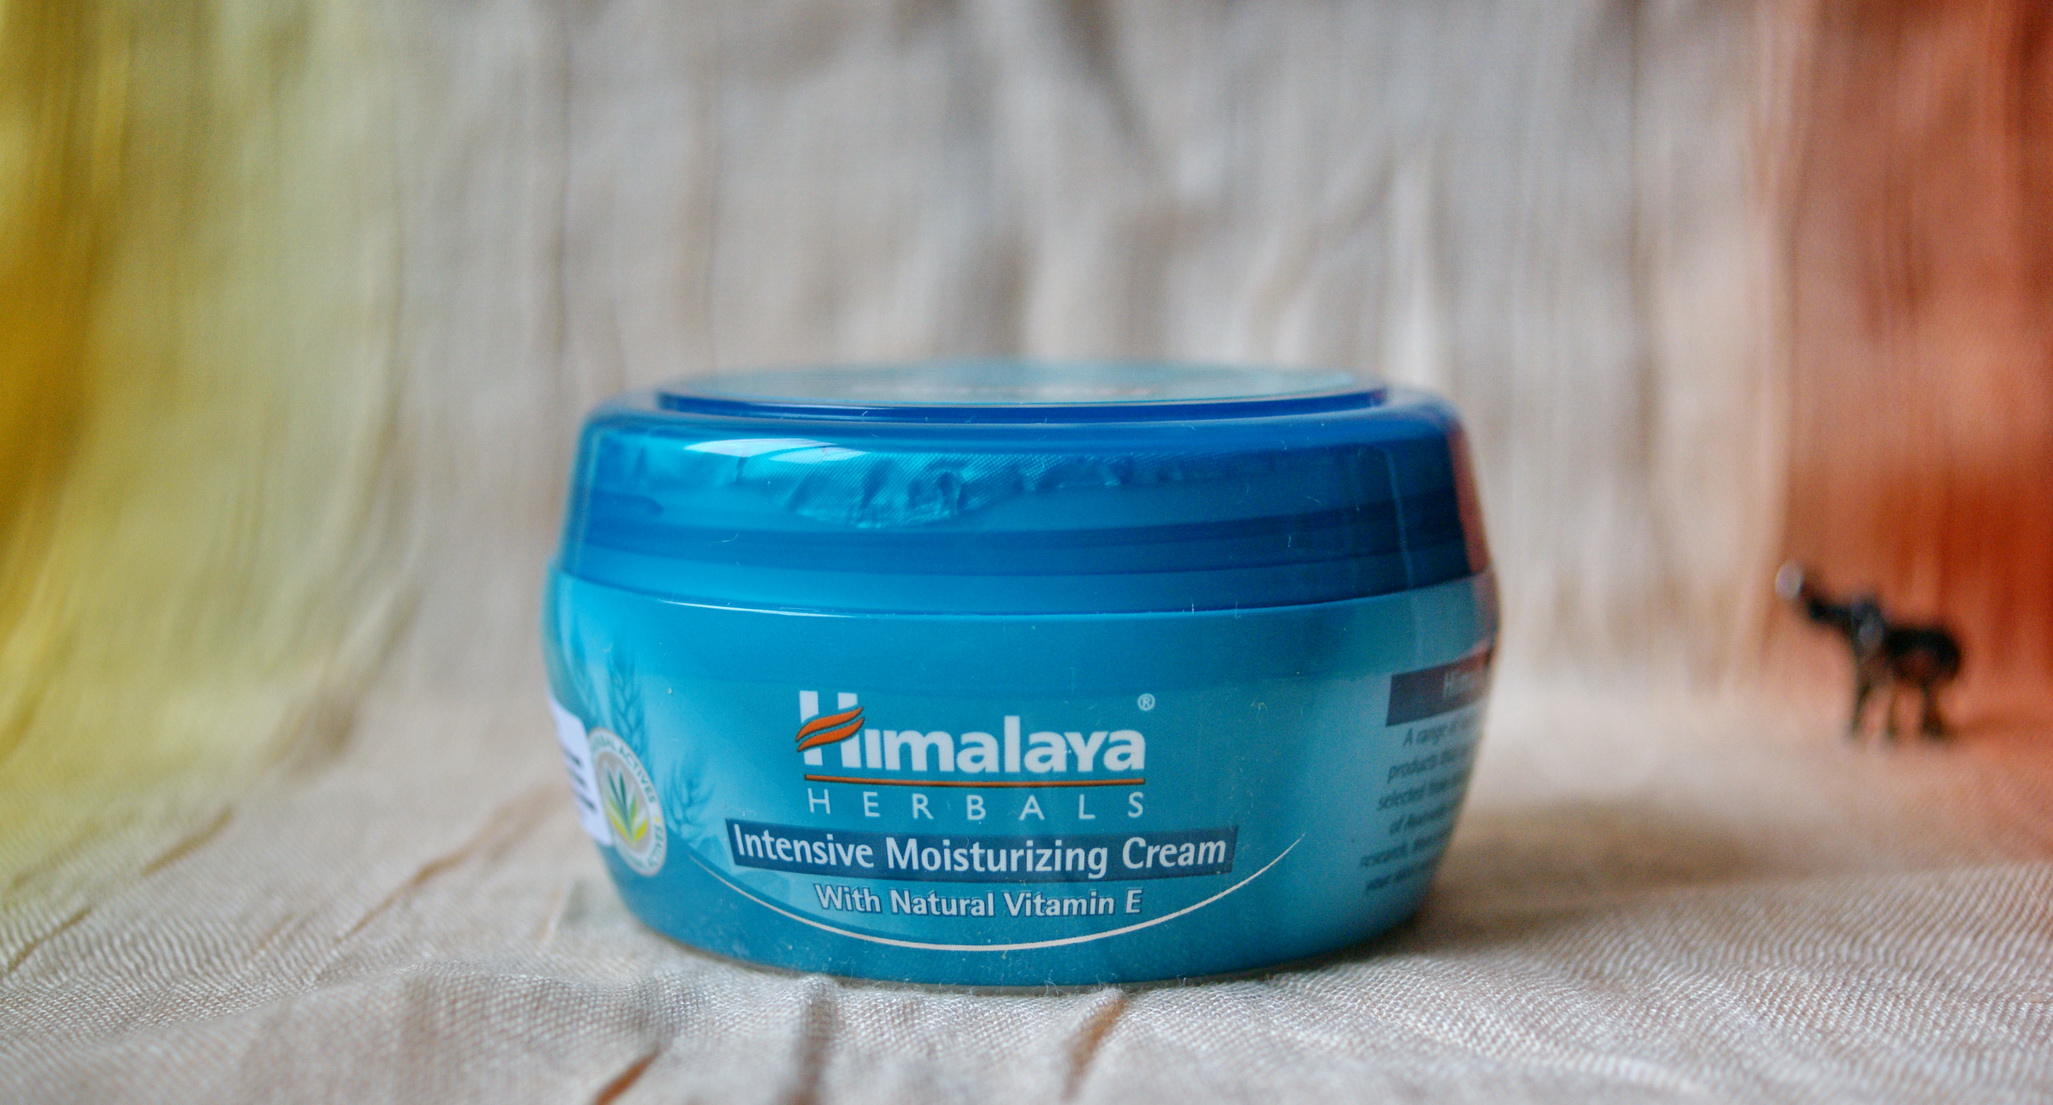 Himalaya Intensive Moisturizing Cream With Natural Vit E 150ml Nourishing Skin 50ml